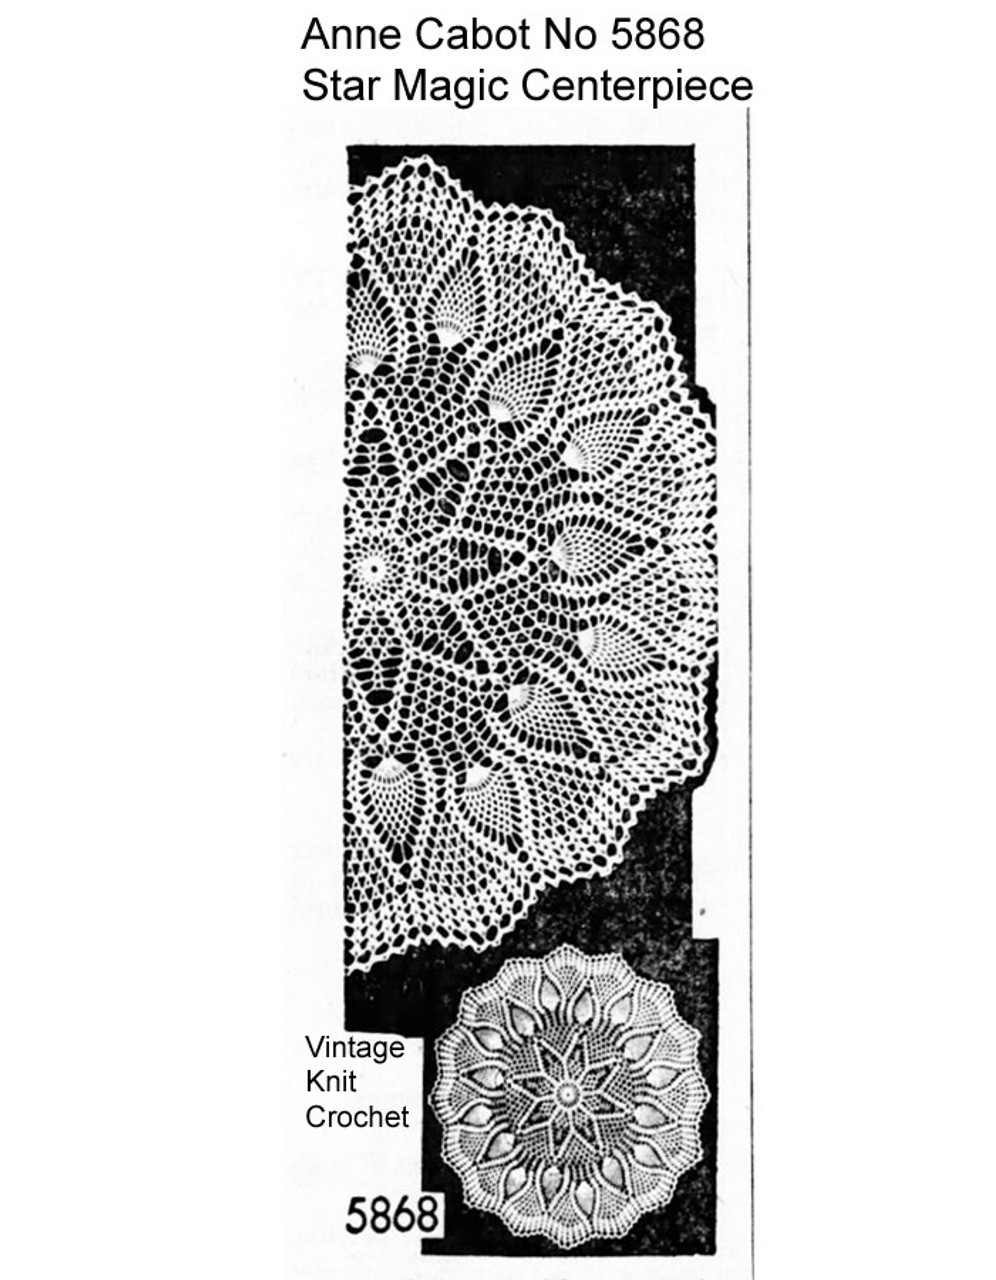 Crochet Star Centerpiece Doily Pattern, Anne Cabot 5868